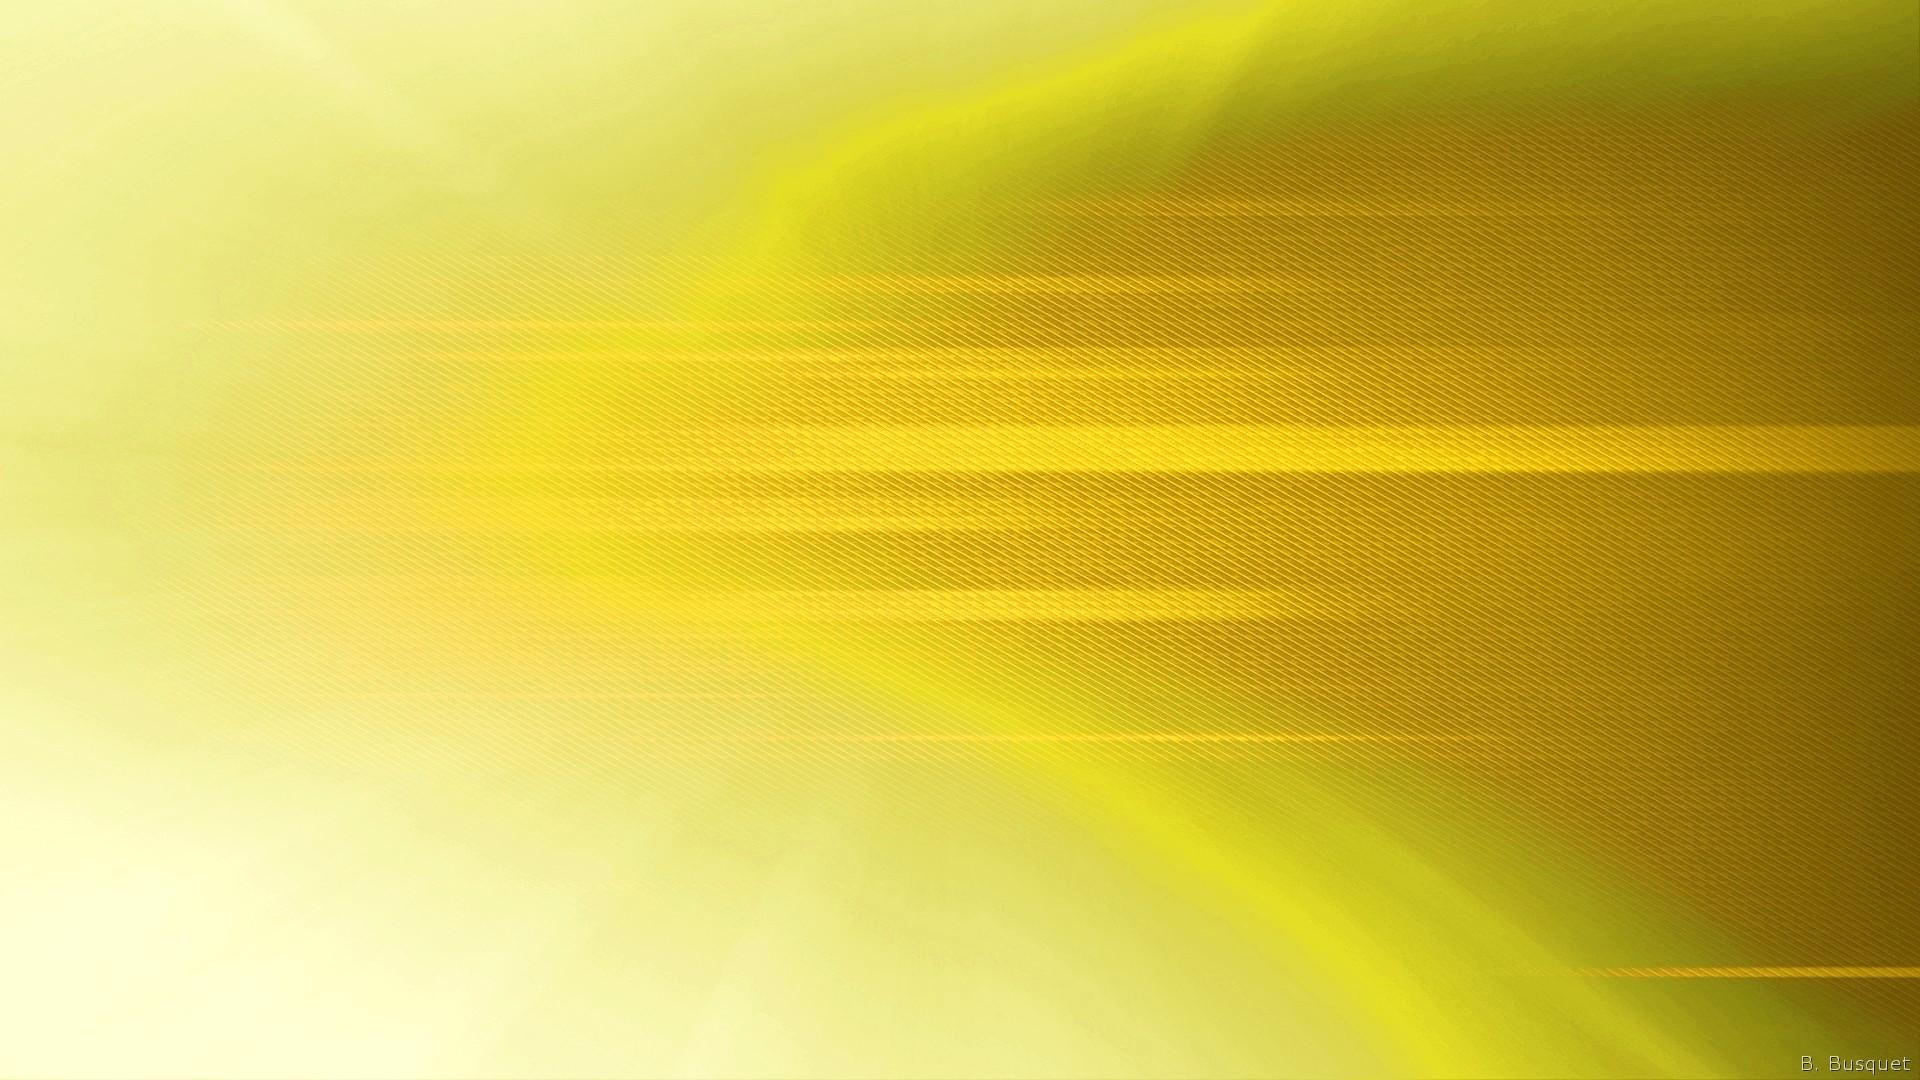 yellow abstract wallpaper hd - photo #8